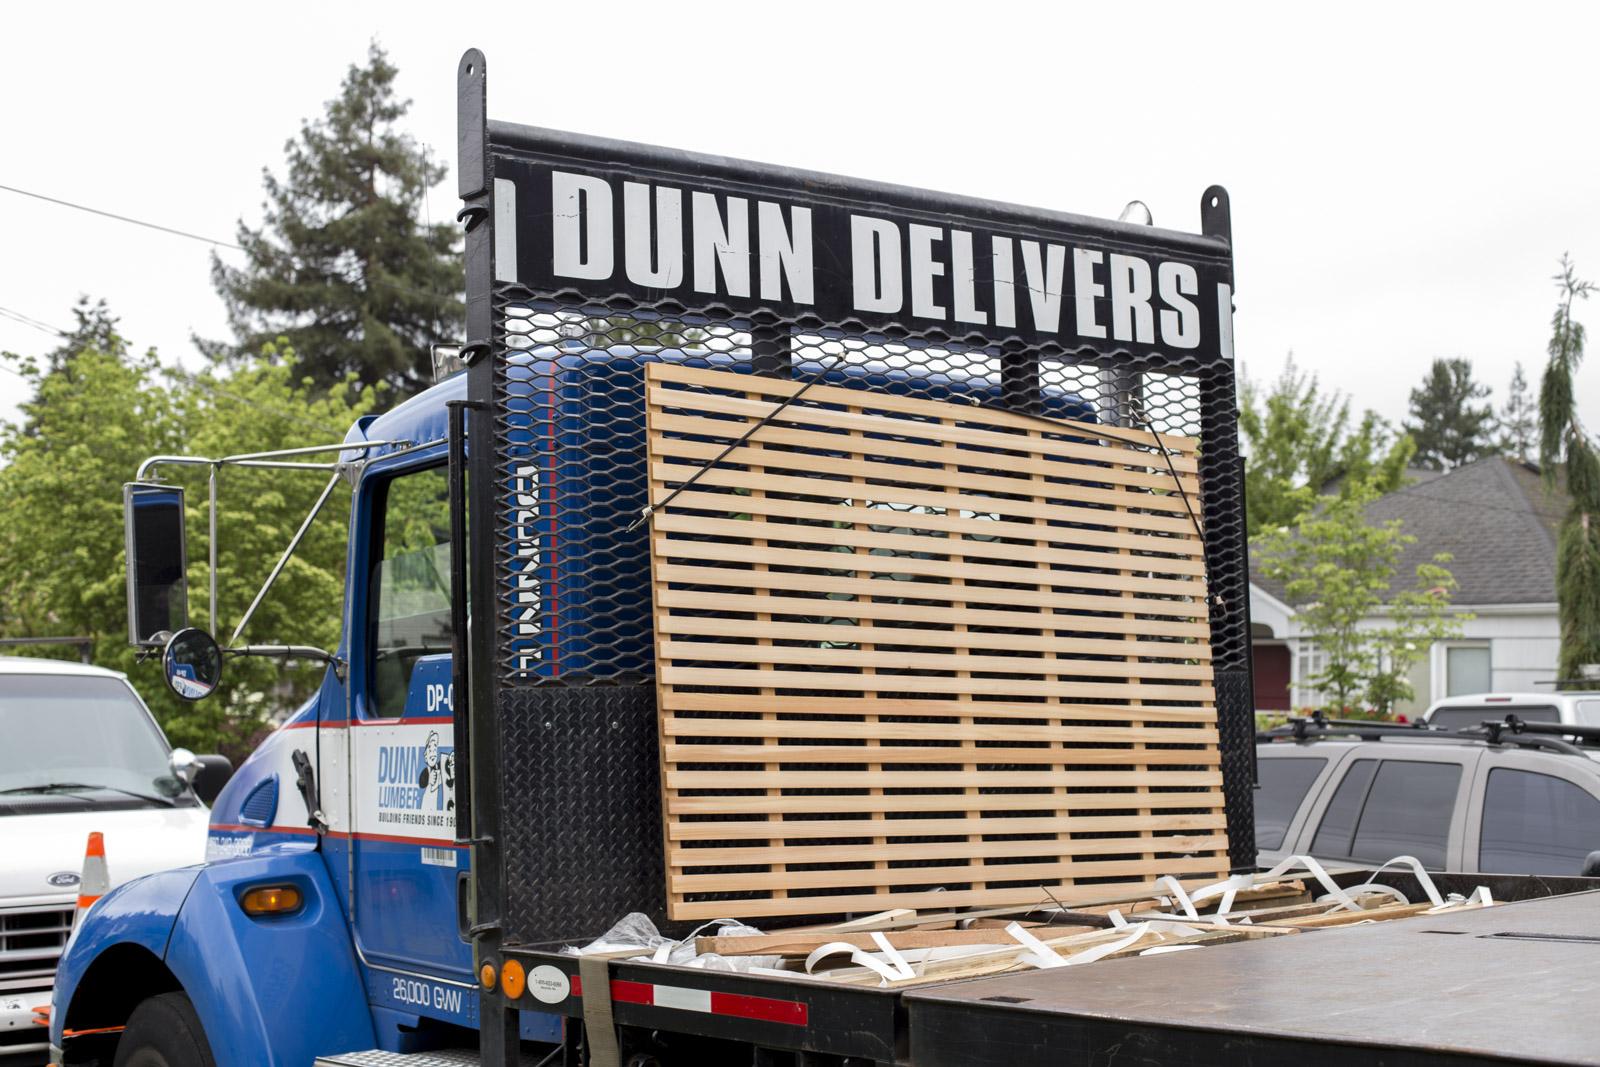 dunn lumber delivering wood for sandbox